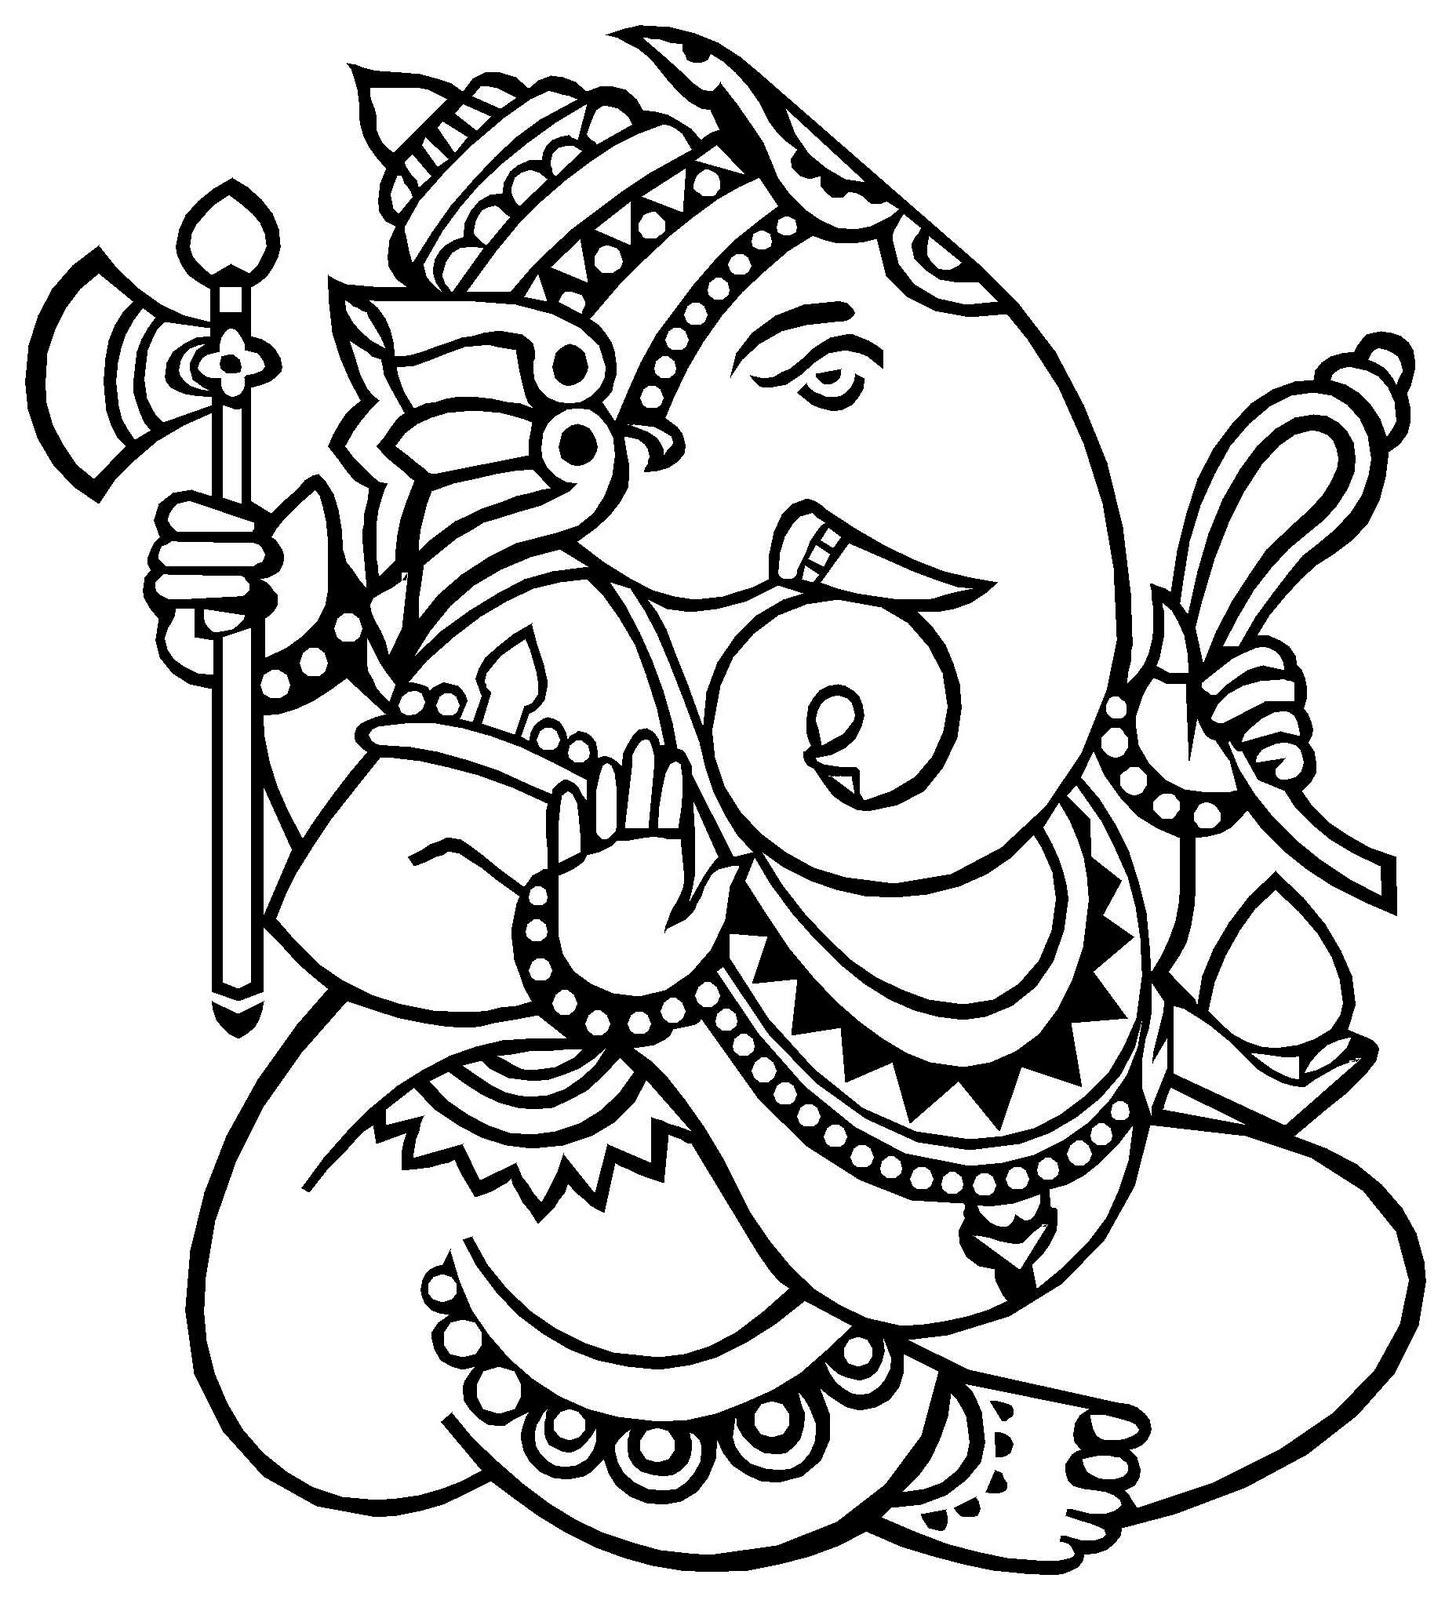 1456x1600 Simple Drawing Of Lord Ganesha Ganesh Ji Drawing For Kids